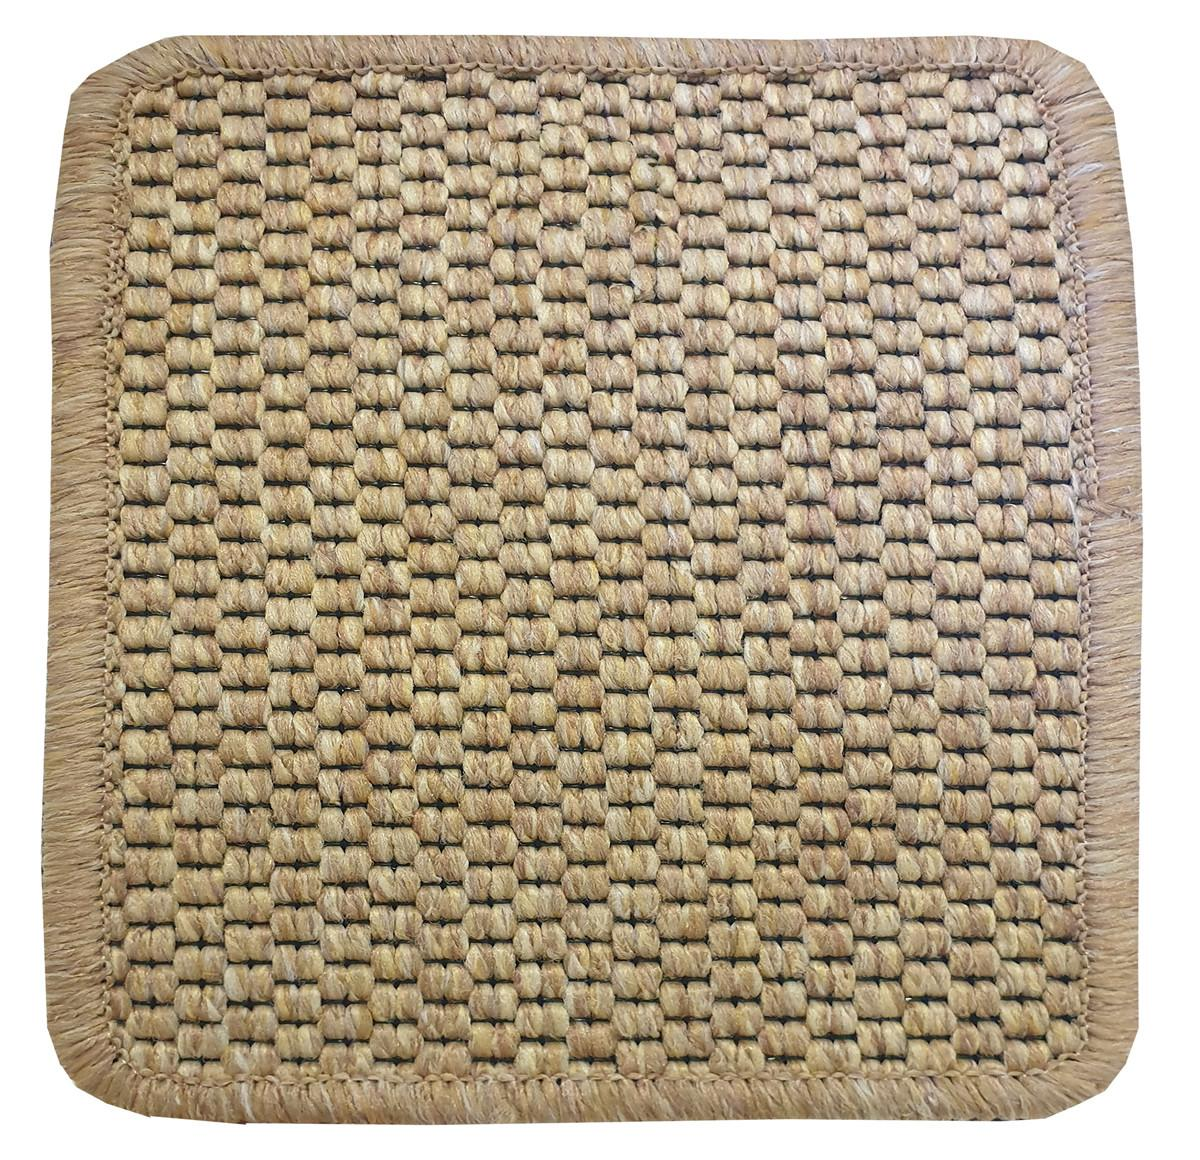 Vopi koberce Kusový koberec Nature terra čtverec - 400x400 cm